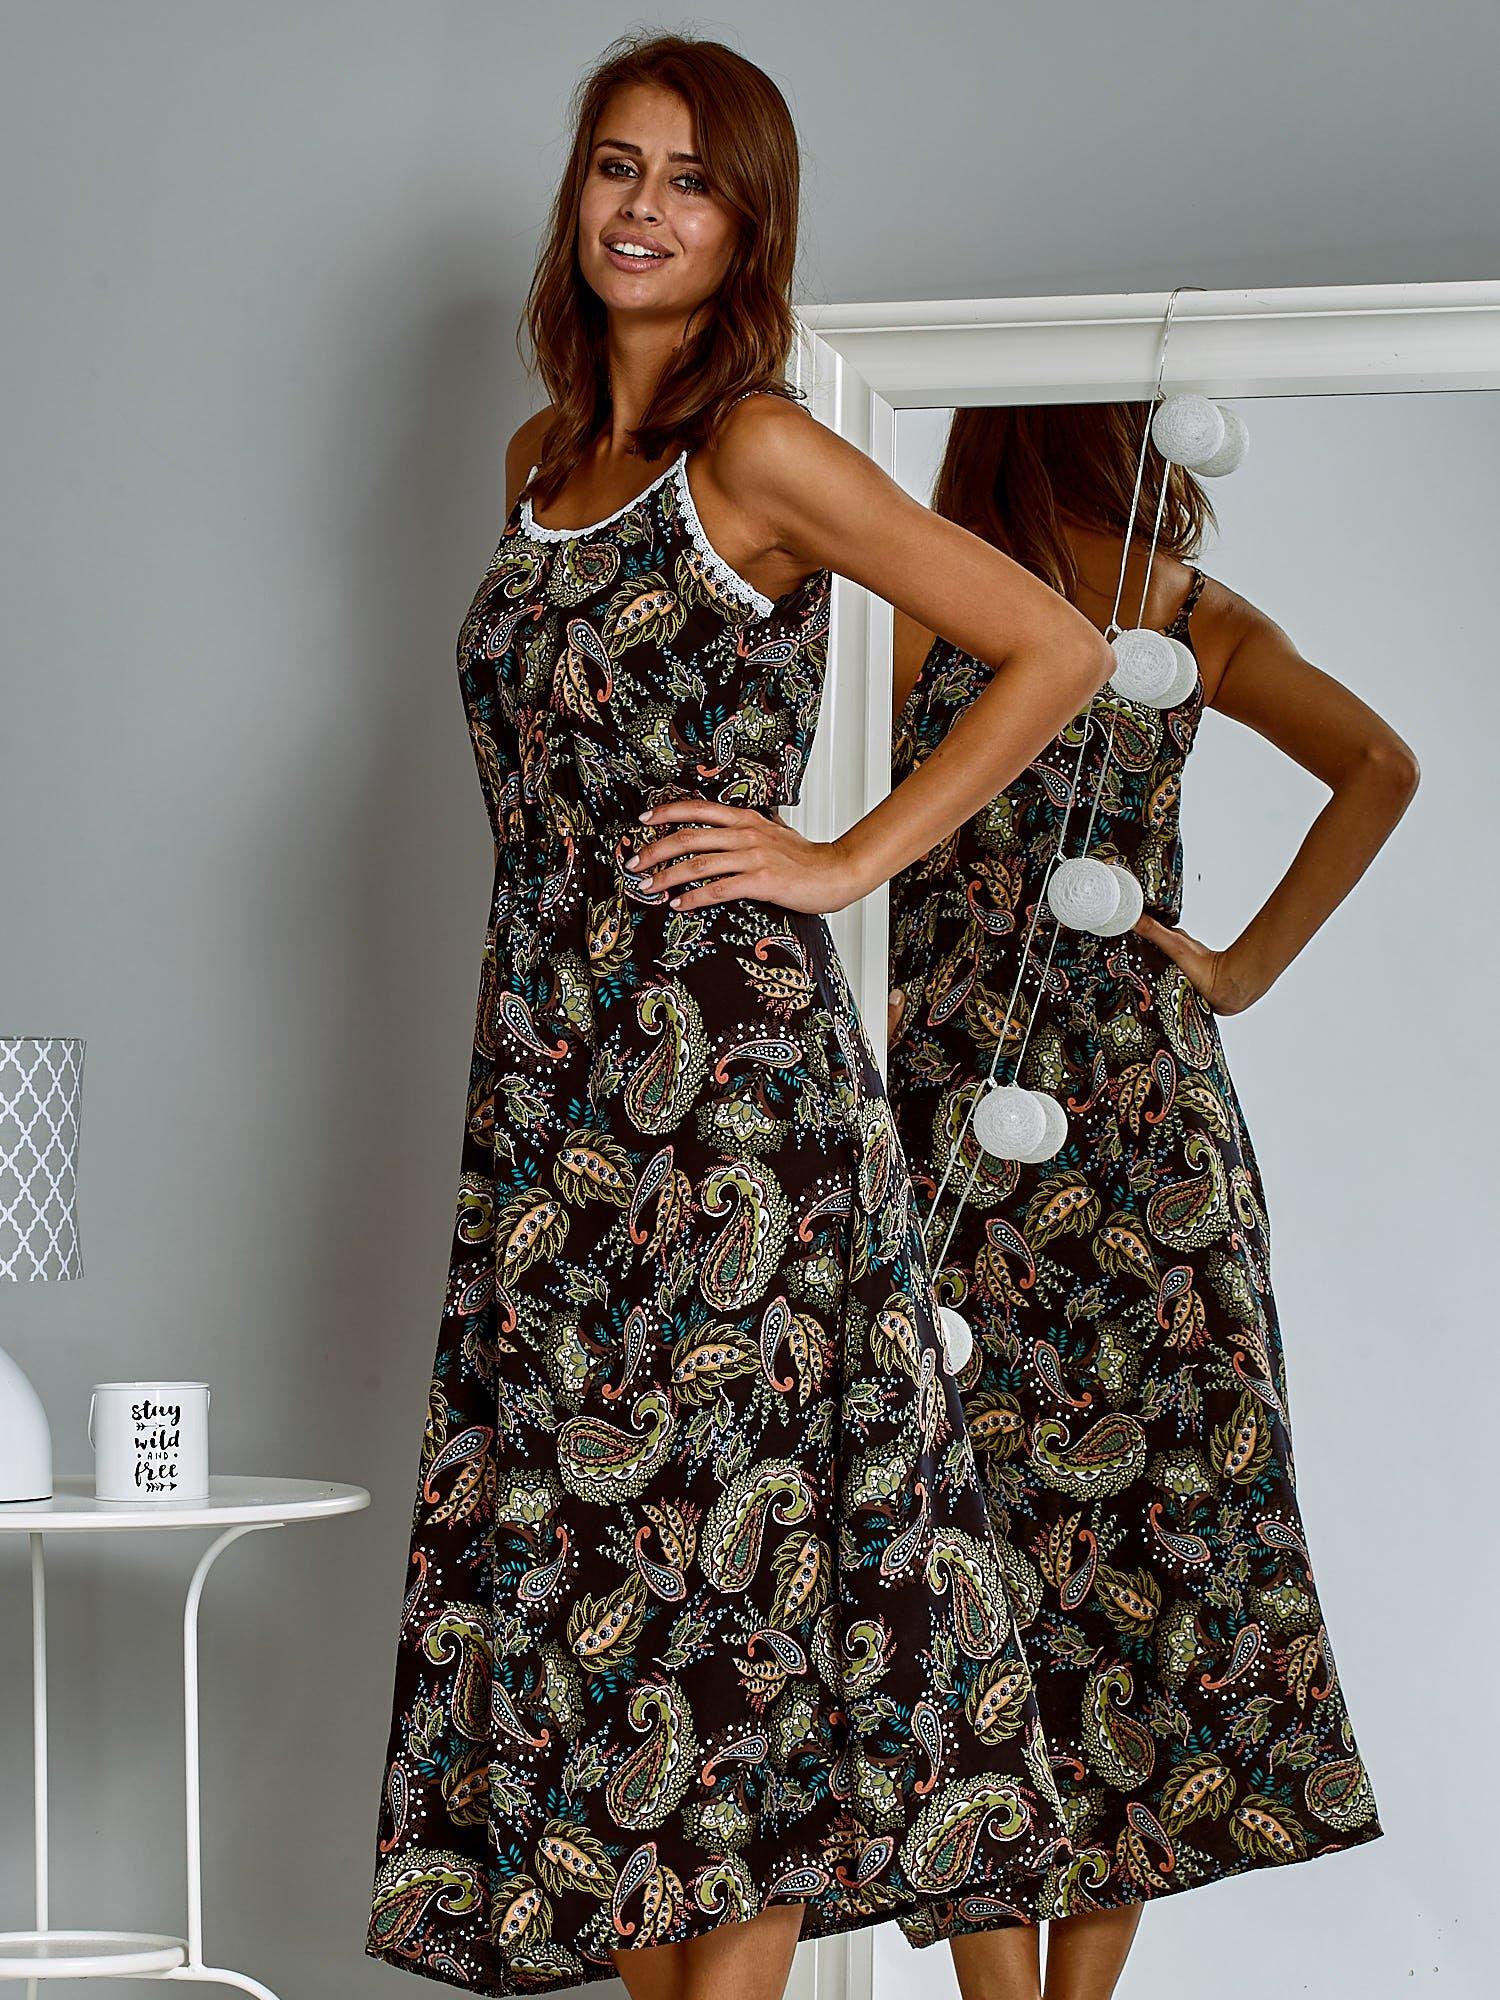 4e43942242 Letnia sukienka maxi z nadrukiem paisley czarna - Sukienka na wesele ...